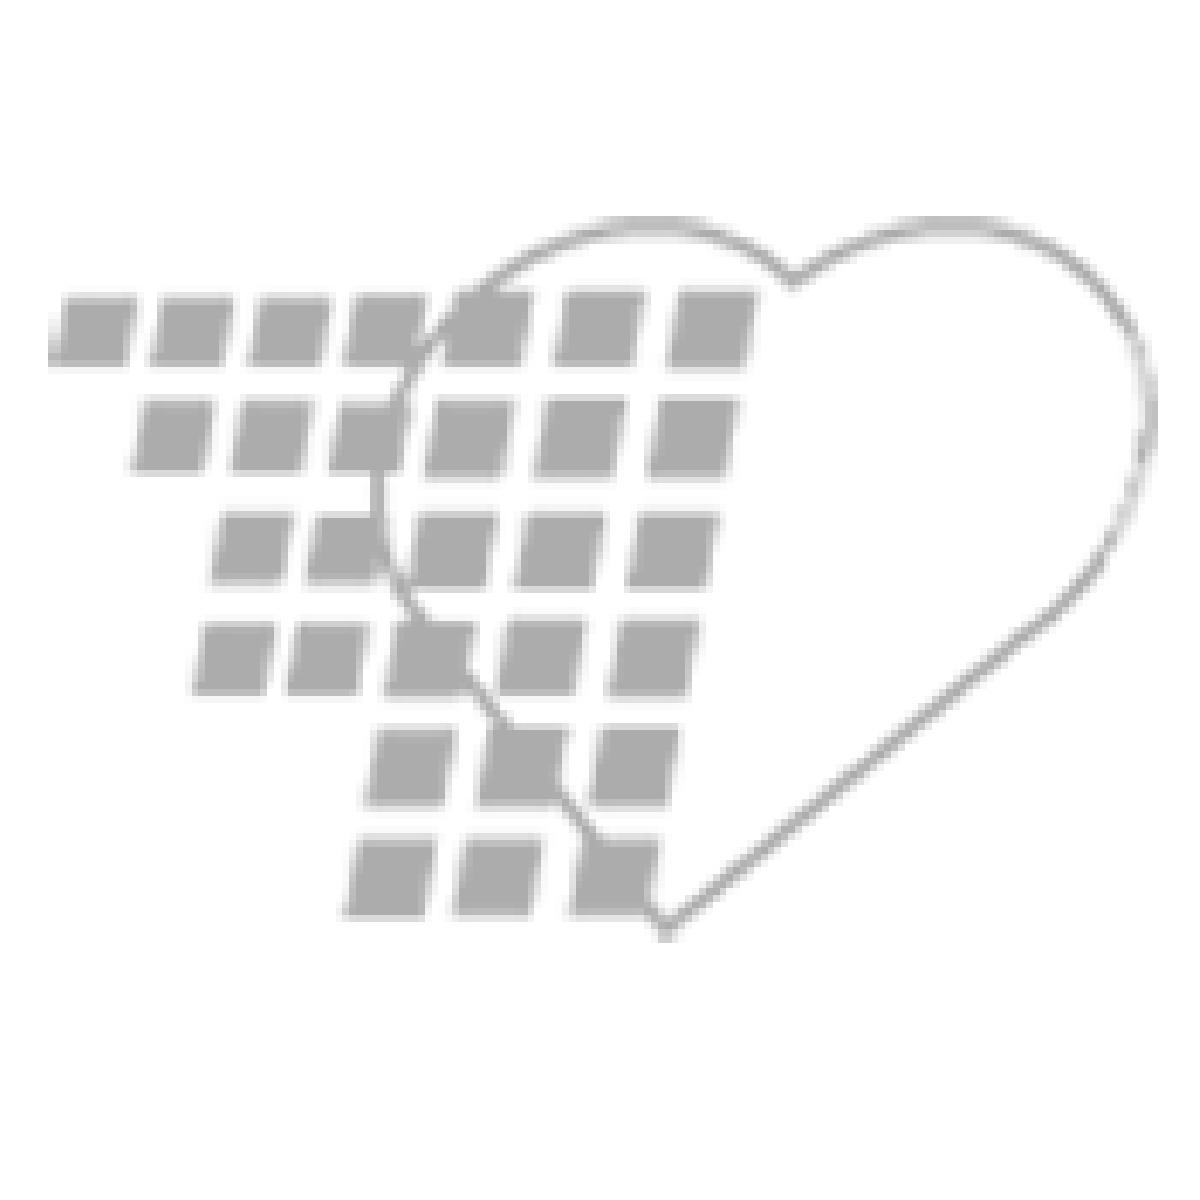 06-93-0050 - Demo Dose® Aspirn (ASA) 81 mg - 100 Pills/Box